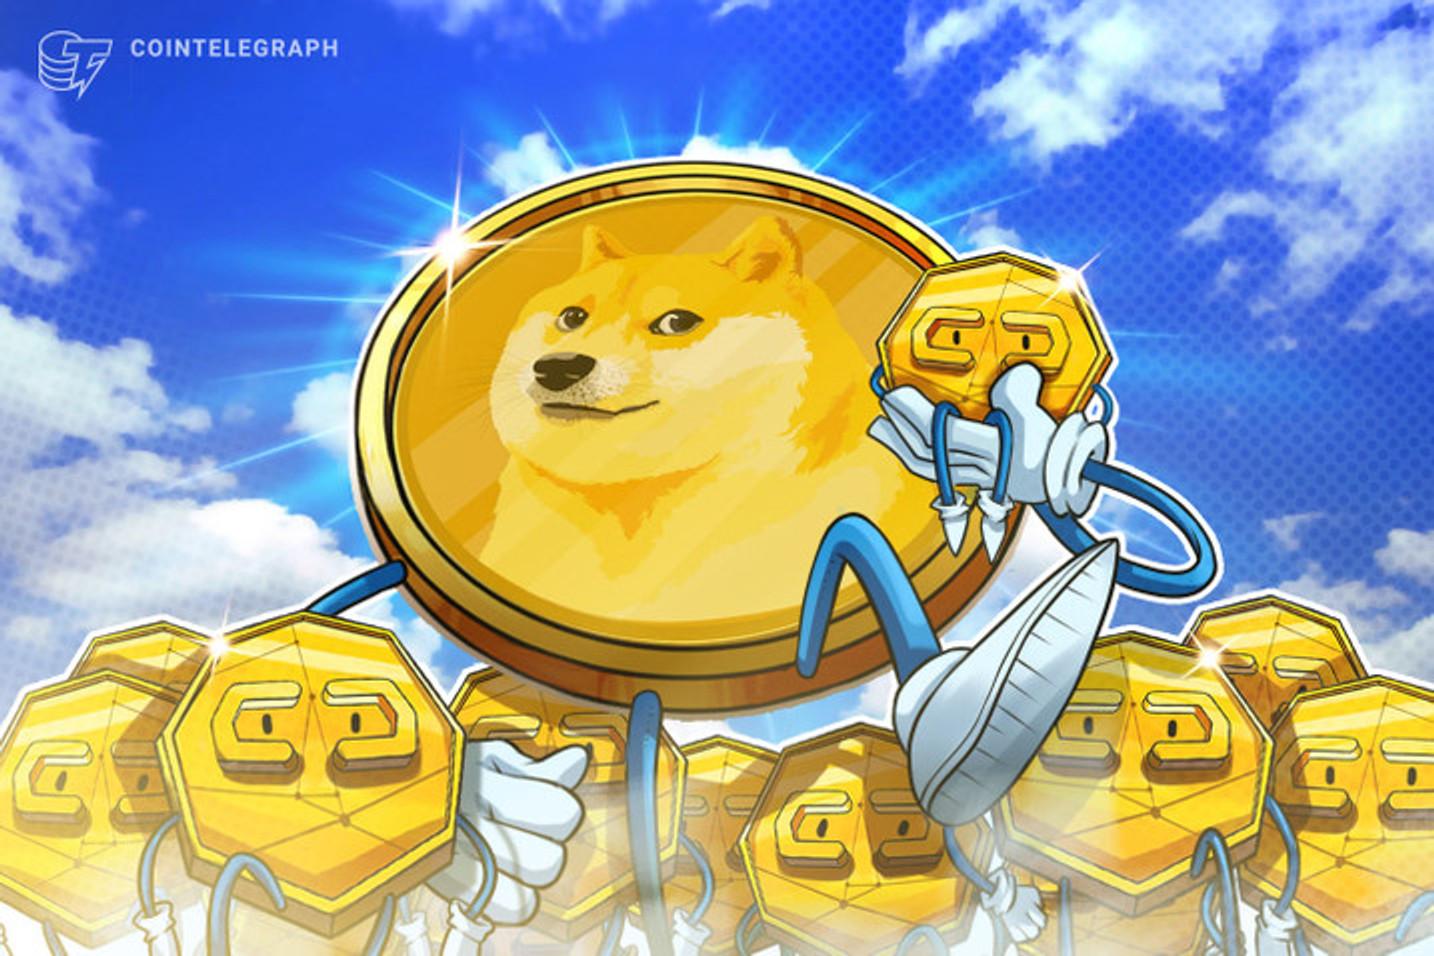 Burger King do Brasil agora aceita pagamentos em Dogecoin para pagar o Dogpper